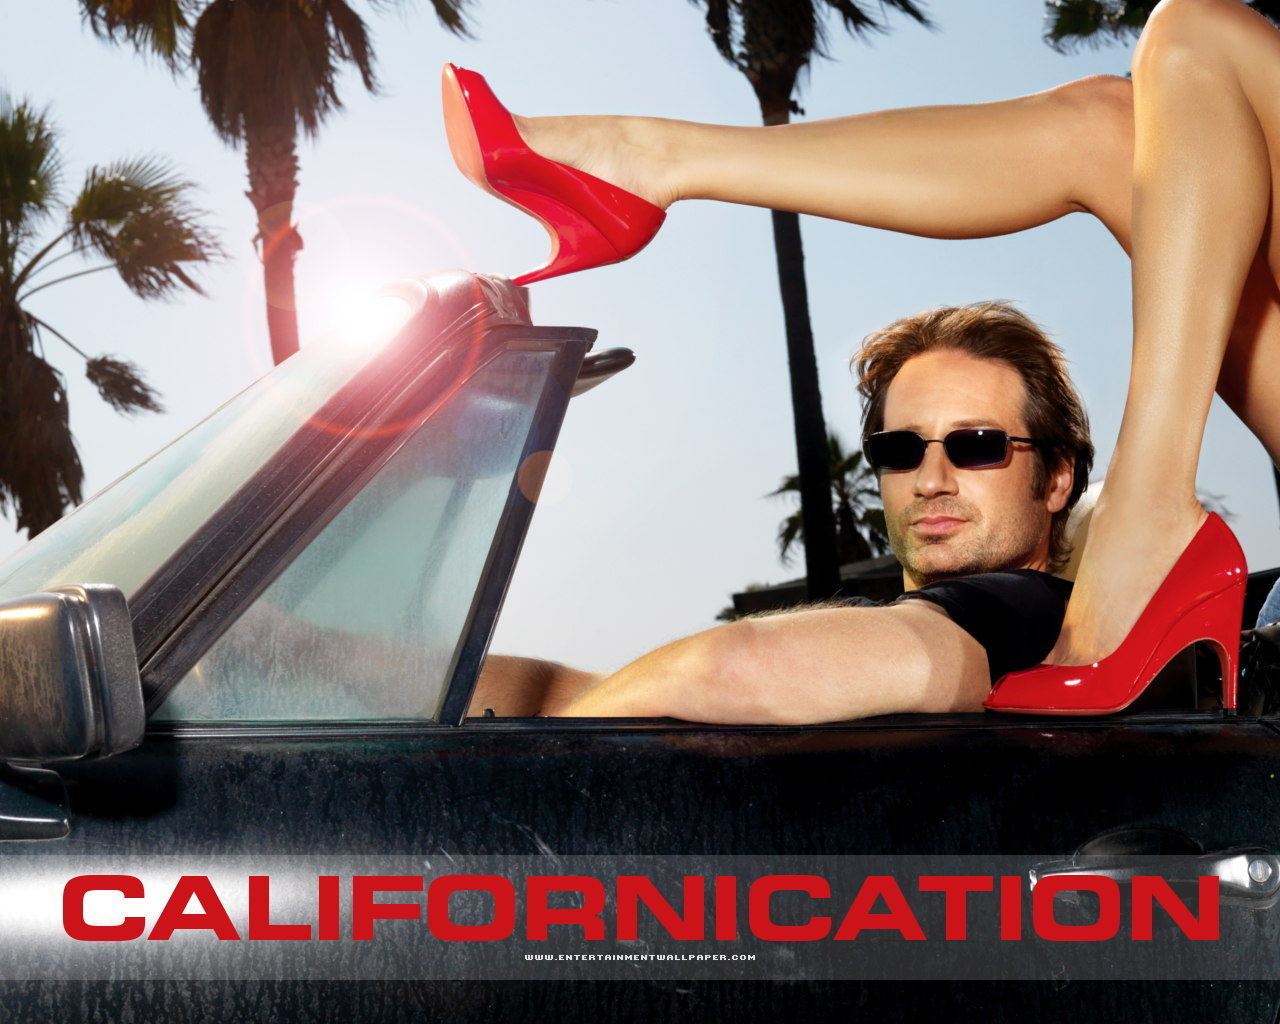 Californication-californication-2953080-1280-1024.jpg